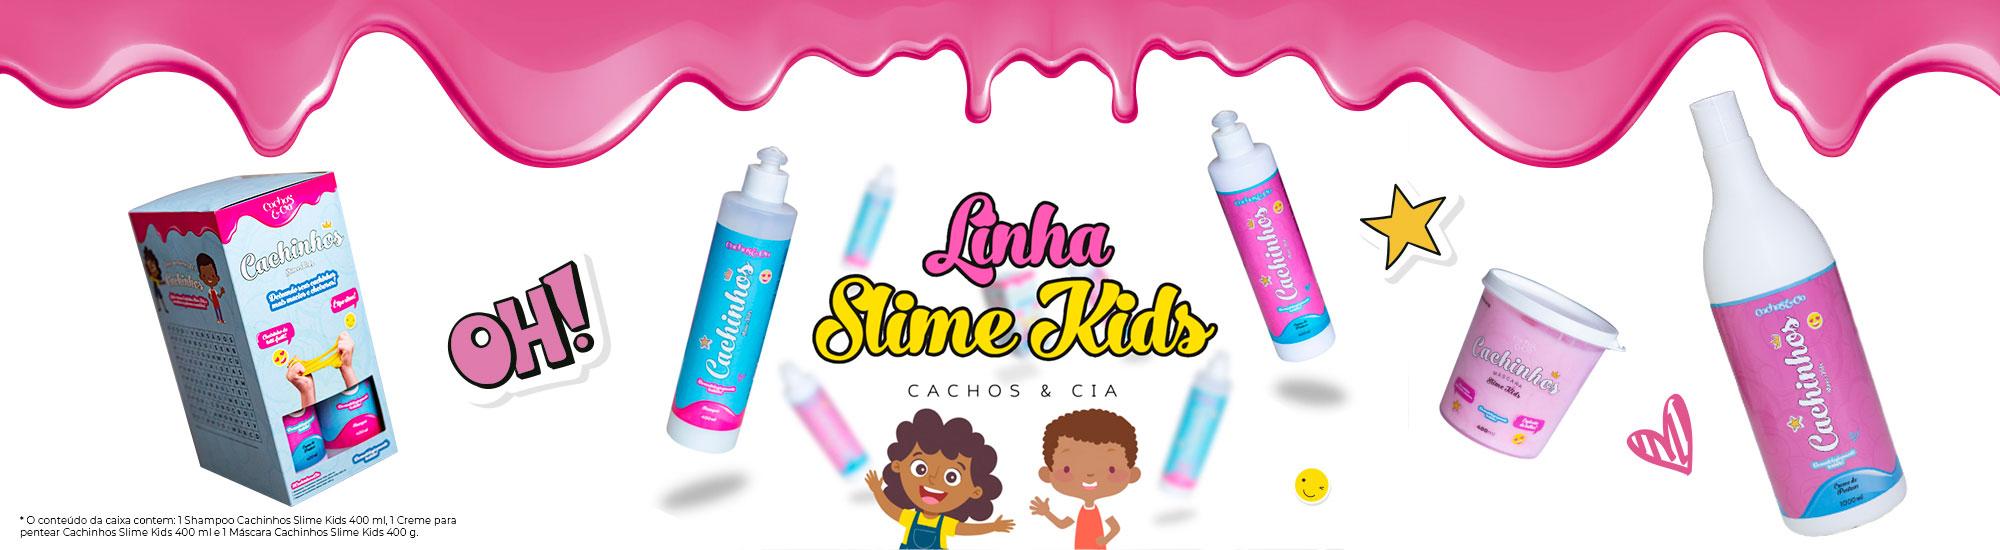 Banner Produtos Slime kids